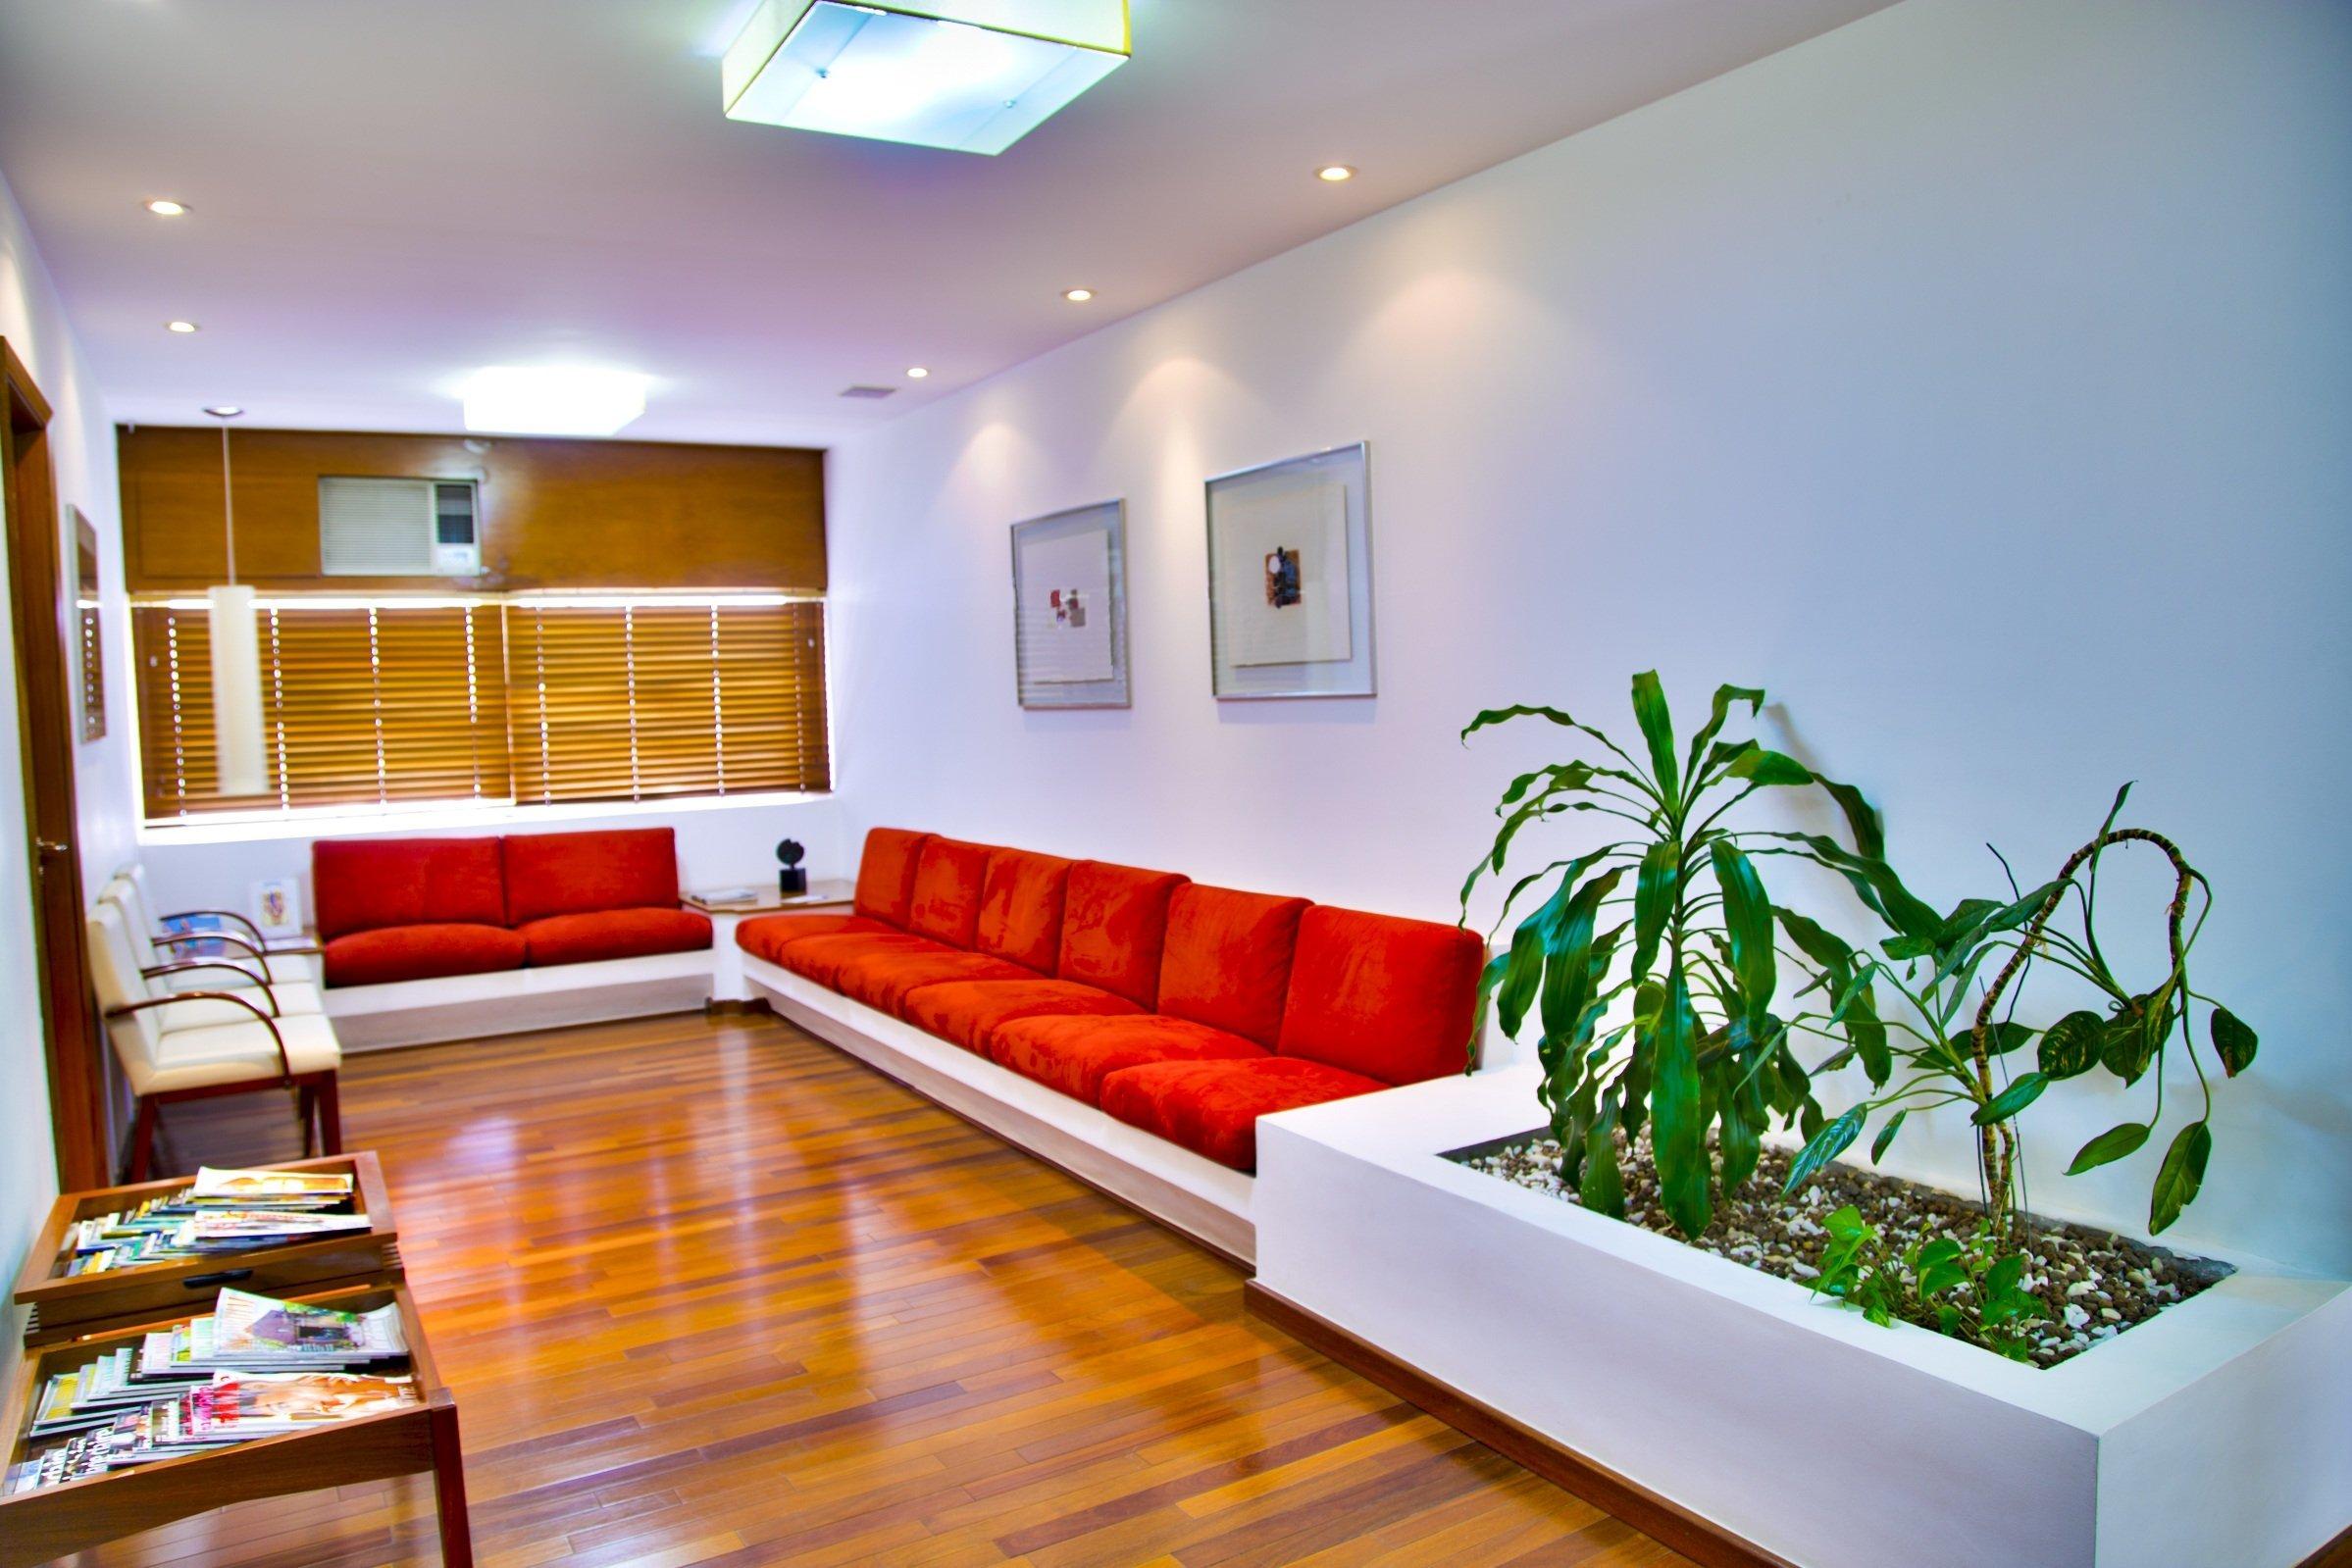 11. Waiting Room